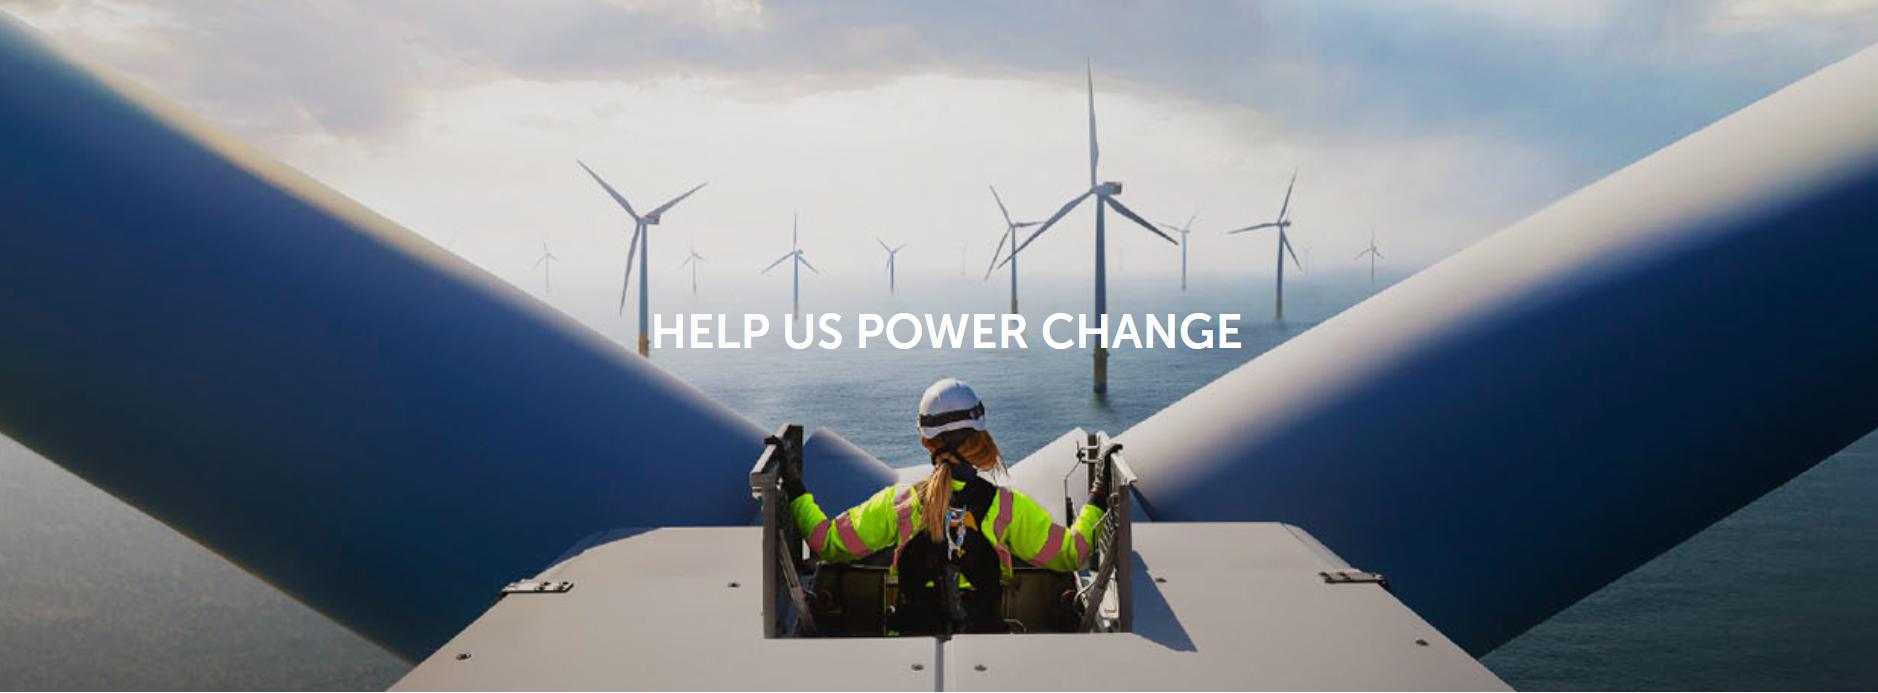 Help us Power Change image